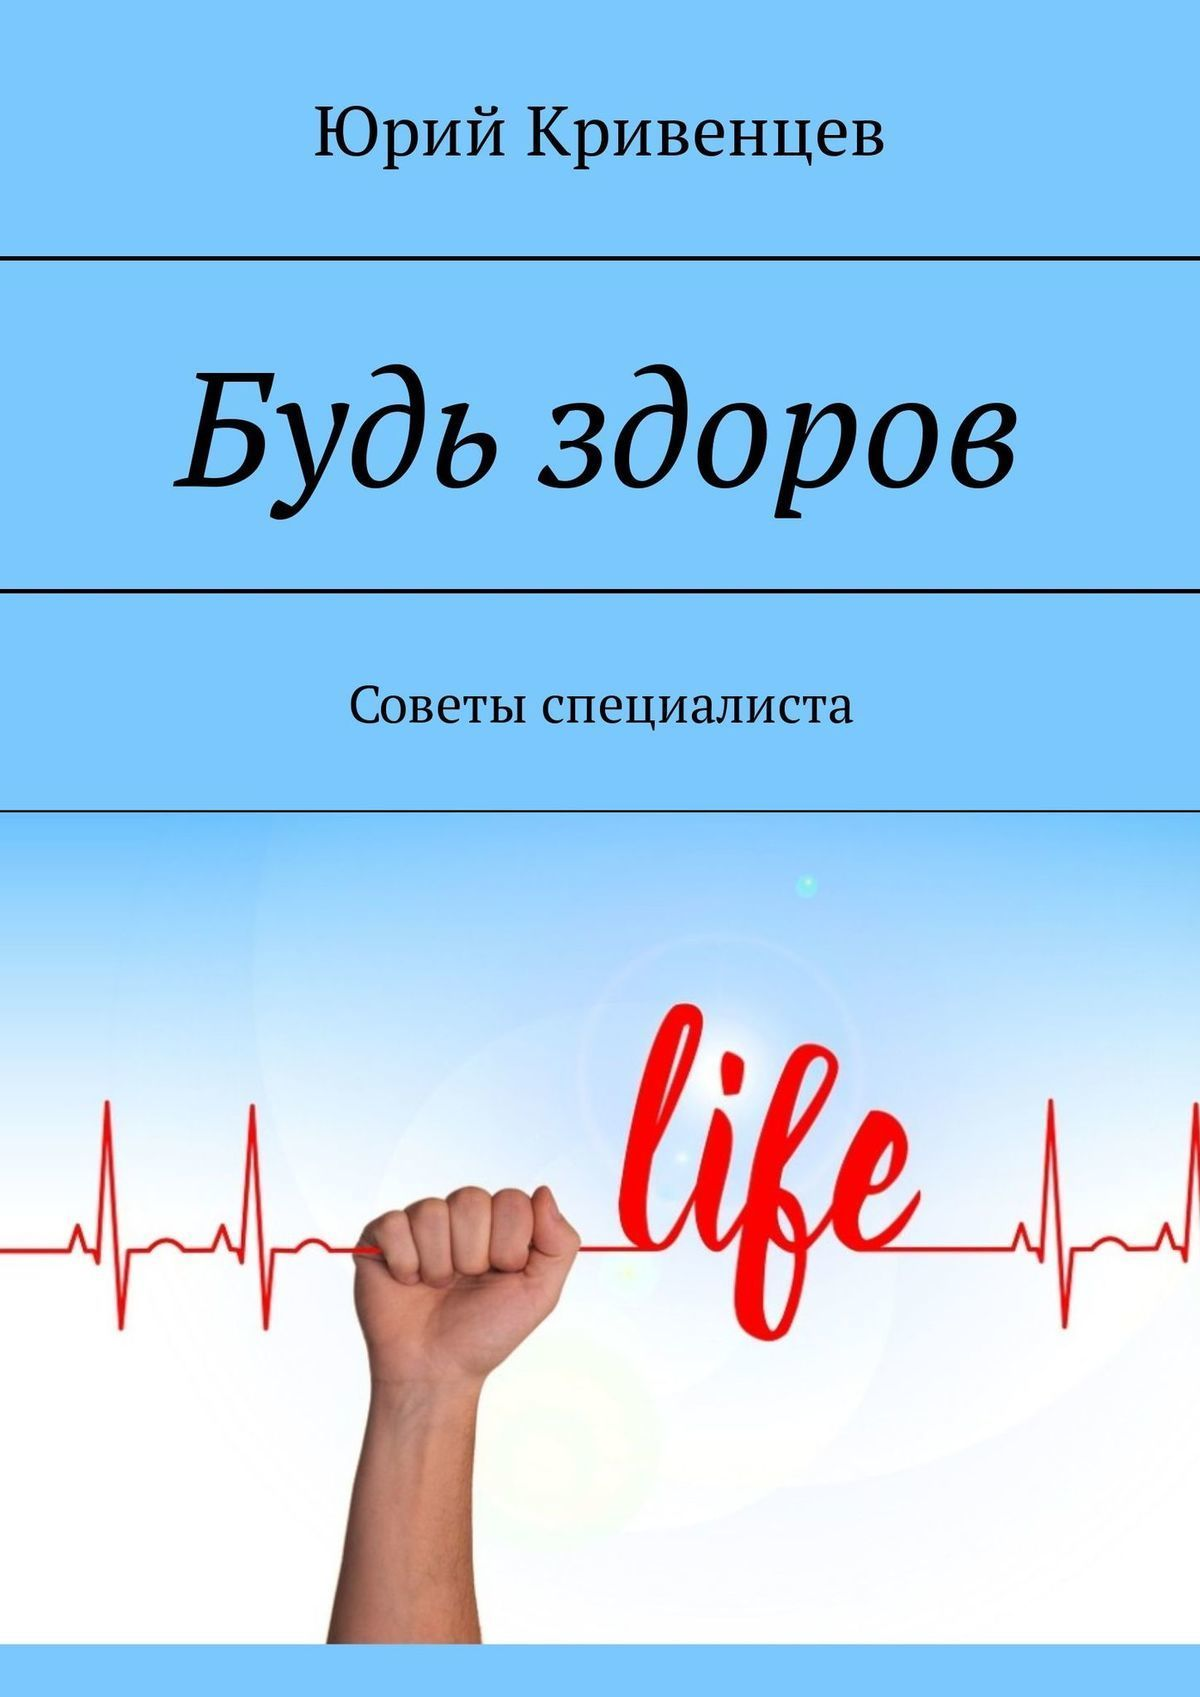 Юрий Кривенцев - Будь здоров. Советы специалиста